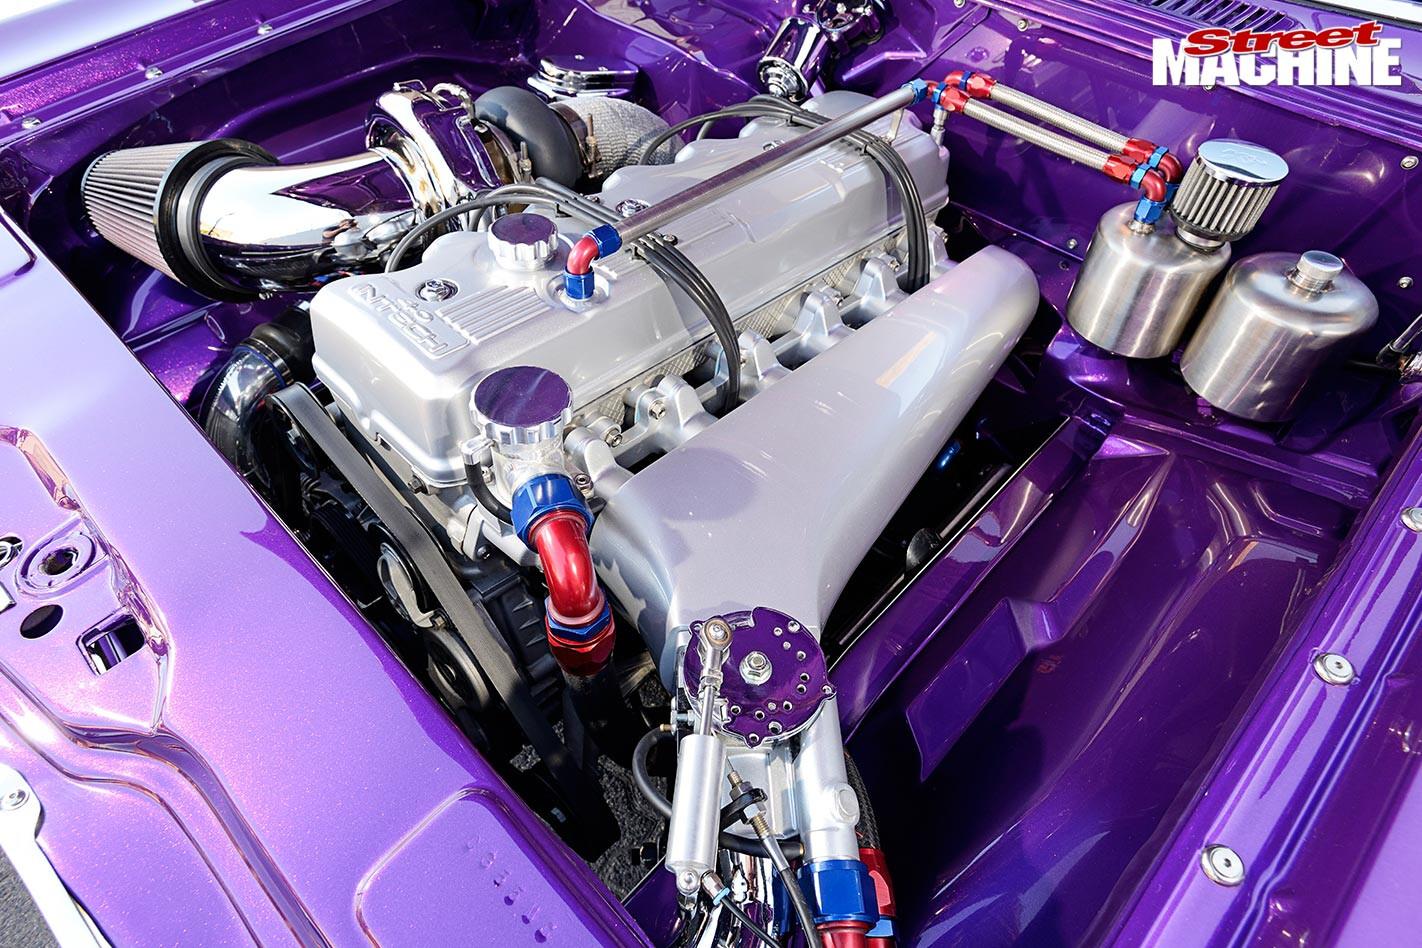 Ford Cortina engine bay